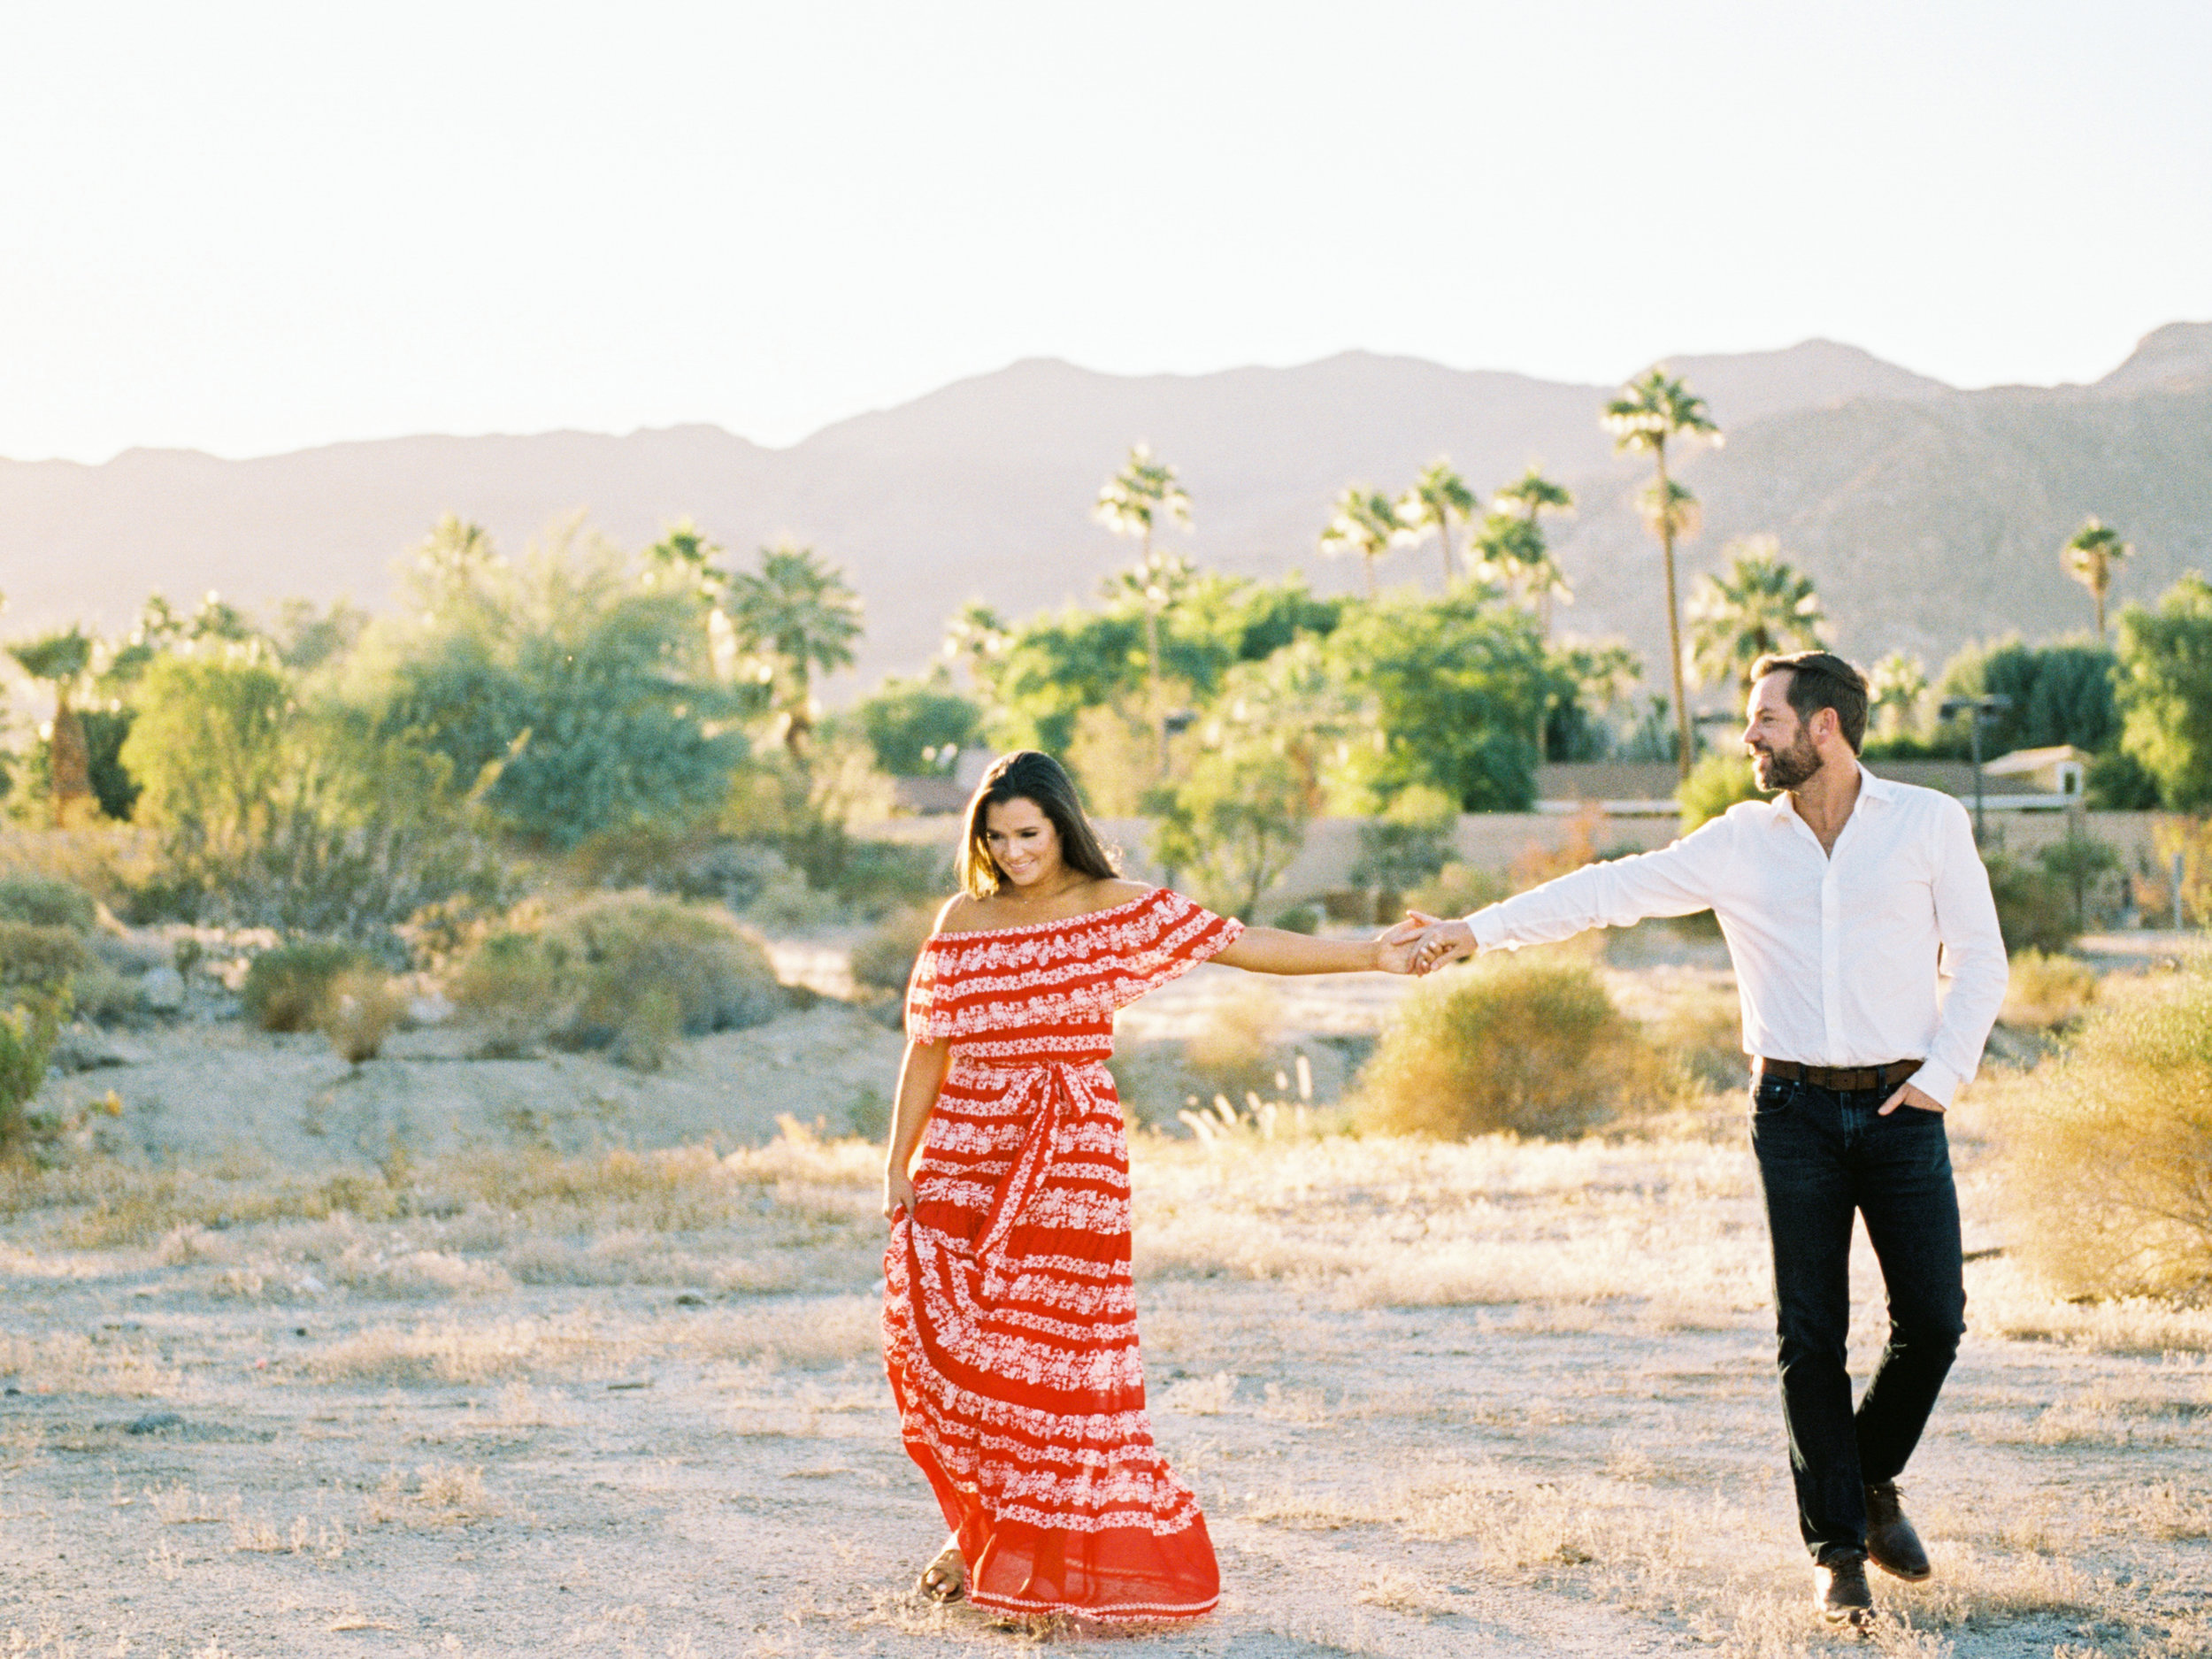 Palm Sprinsg Wedding Photographer Jenny Losee (19 of 32).jpg